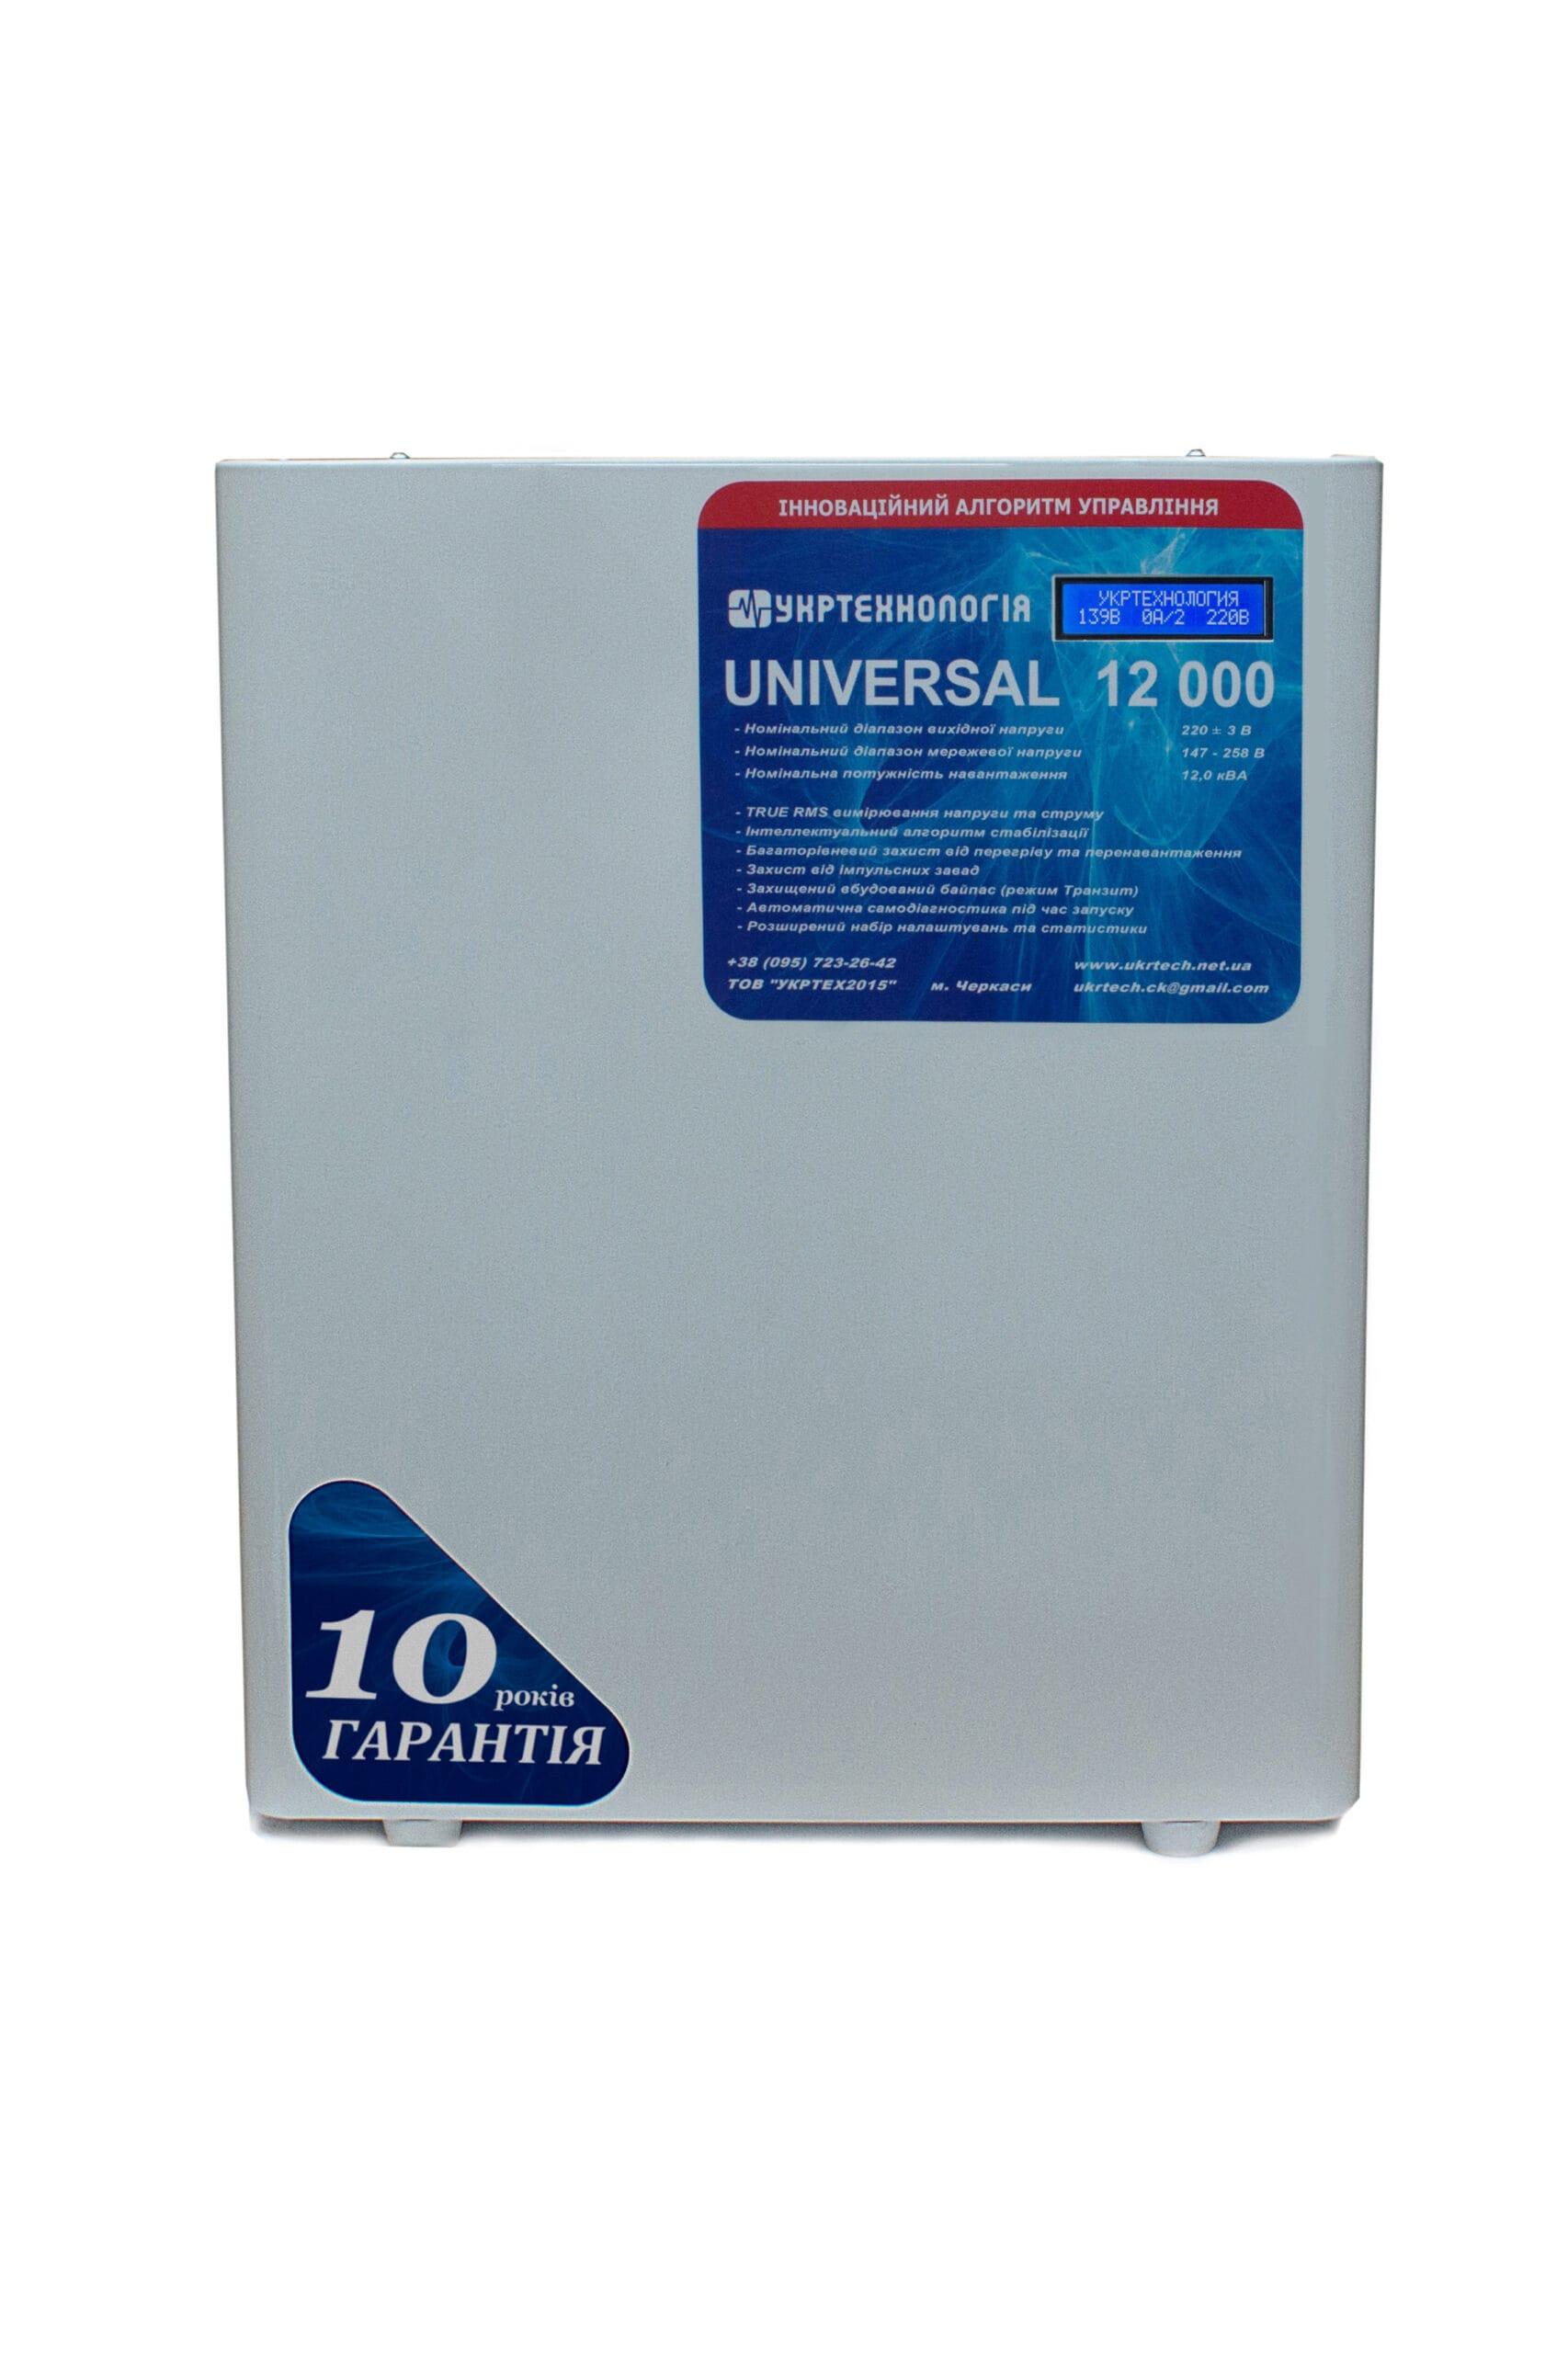 Стабилизаторы напряжения - Стабилизатор напряжения 12 кВт UNIVERSAL 000001420 - Фото 2